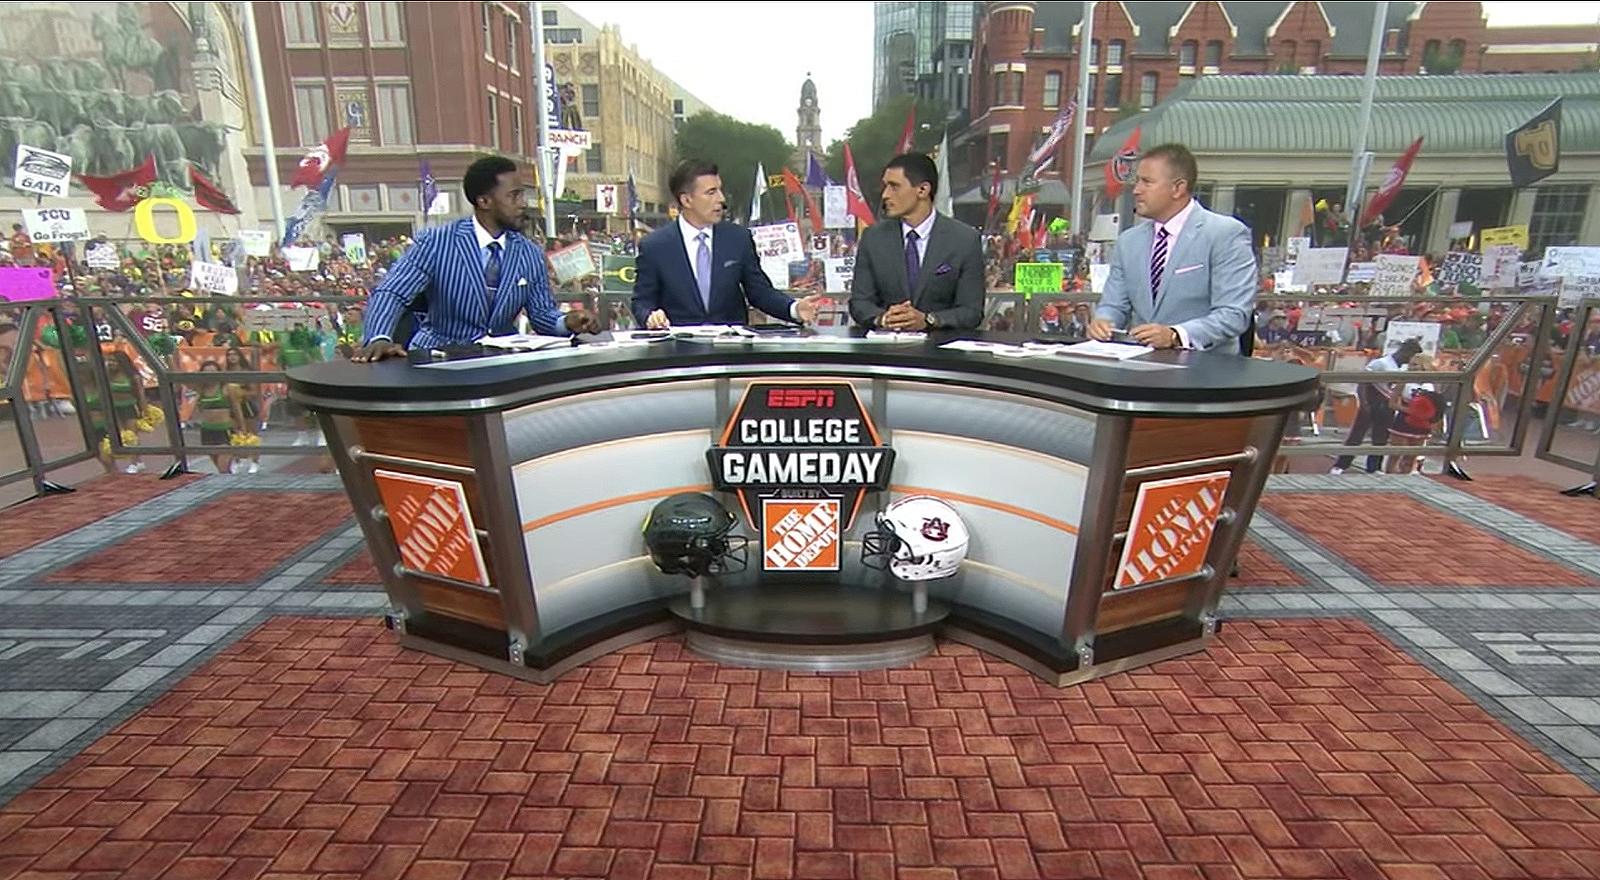 NCS_ESPN-College-Gameday_0002